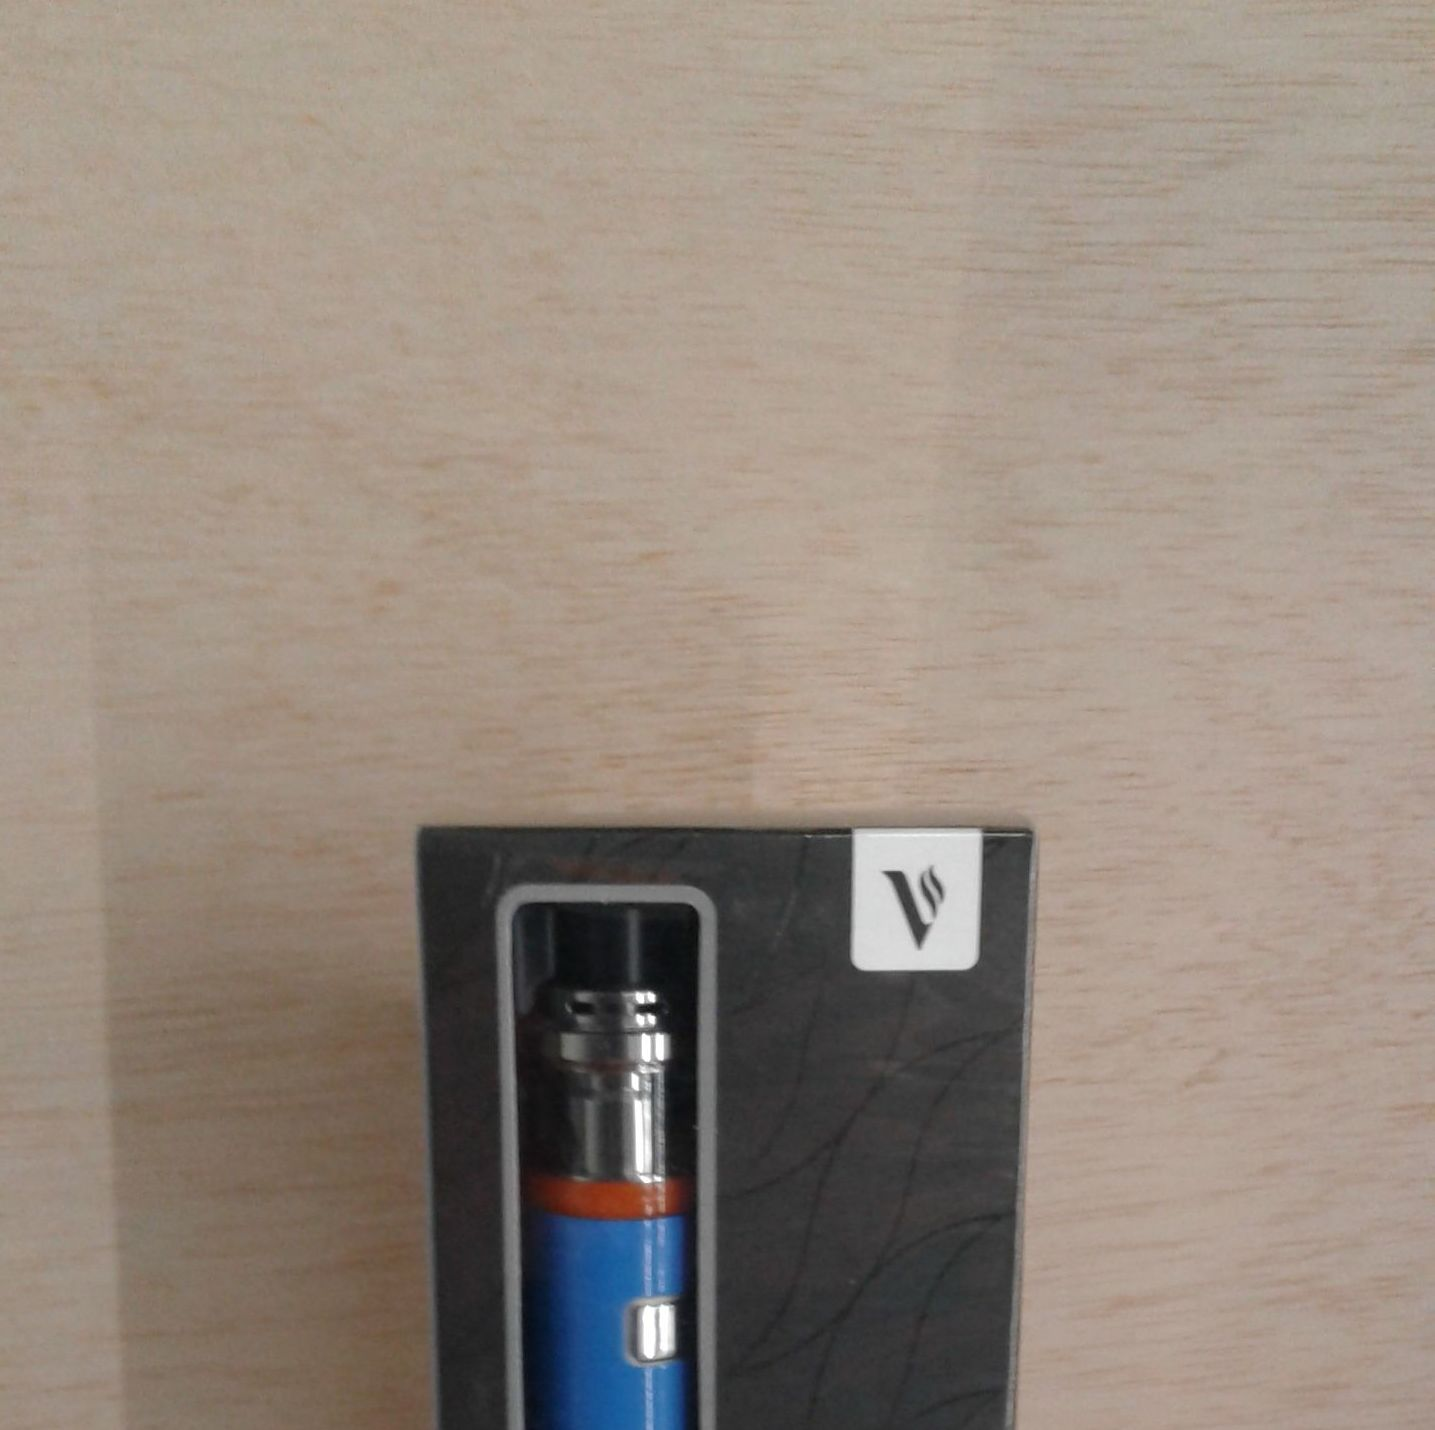 Vaporesso: Servicios de La Esquina del Fumador Gáldar